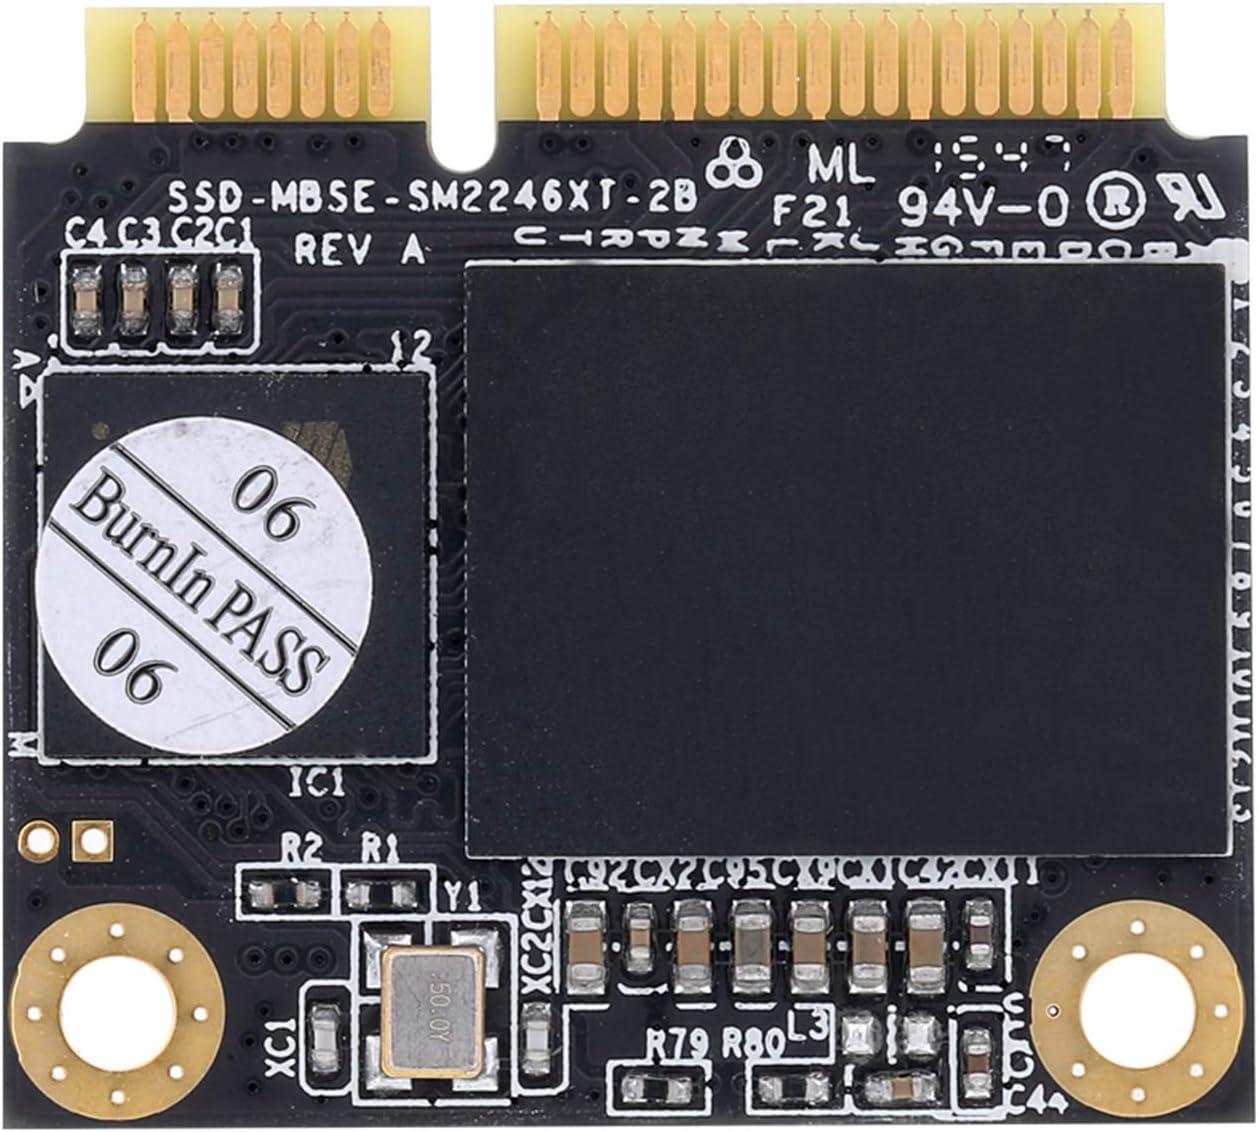 Festnight KingSpec MSATA Mini PCI-E 512G MLC Digital Flash SSD Solid State Drive Storage Devices for Computer PC Desktop Laptop